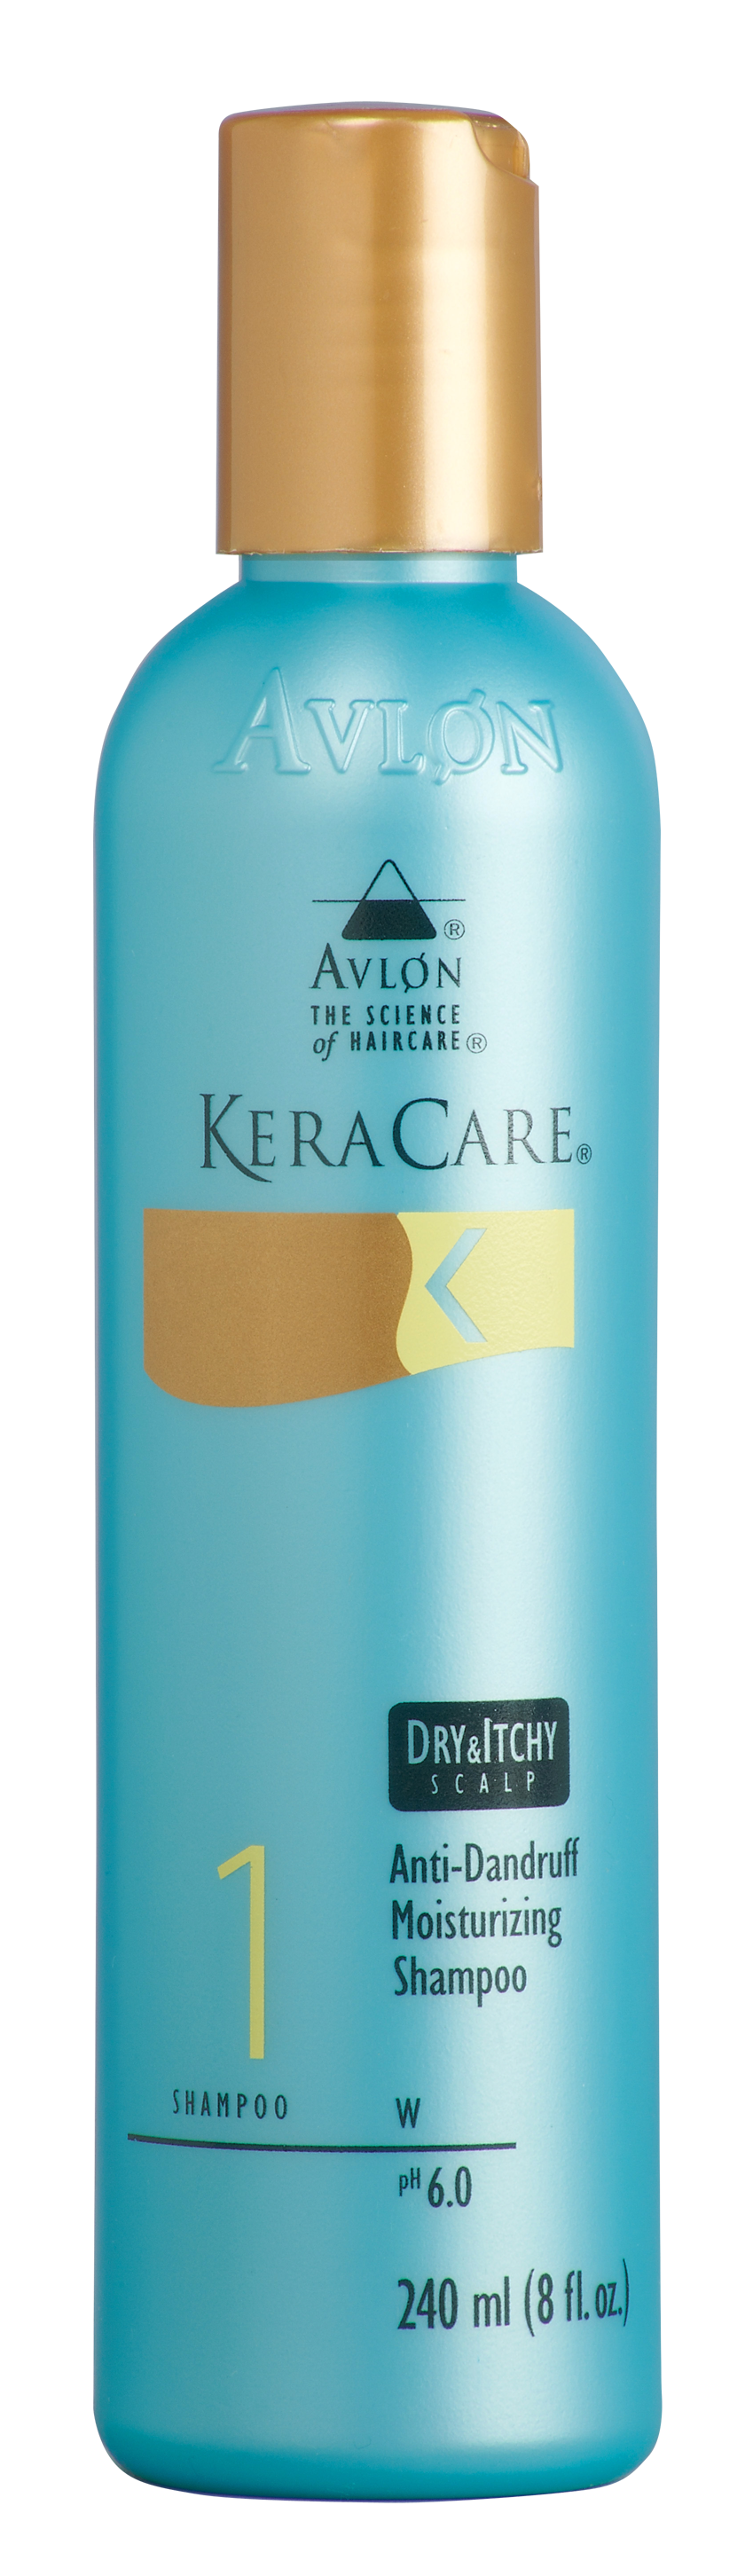 KeraCare Dry& Itchy Anti- Dandruff Moisturizing Shampoo